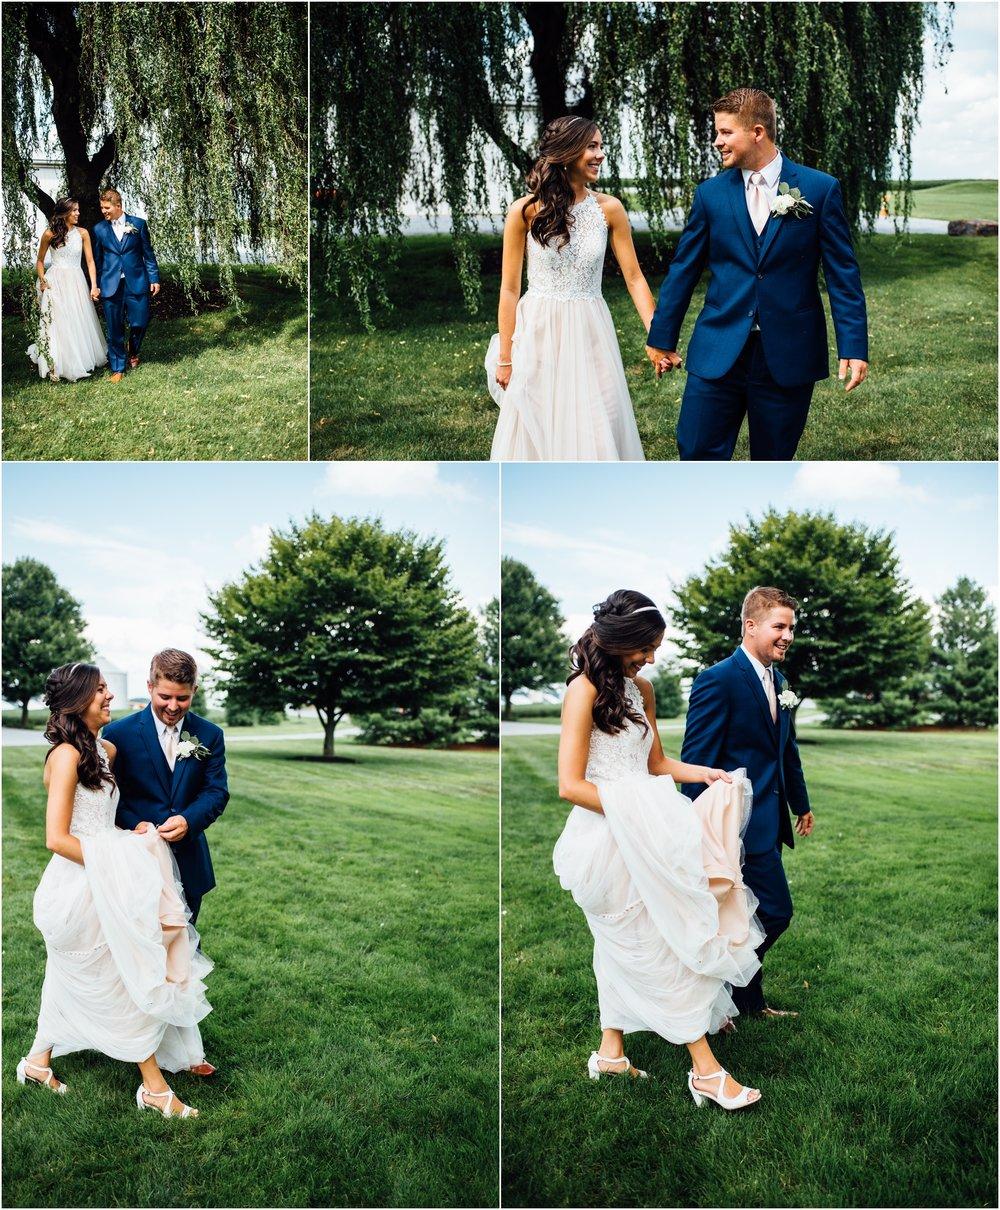 Steph&Bryan_Lancaster_wedding_farm_0528.jpg